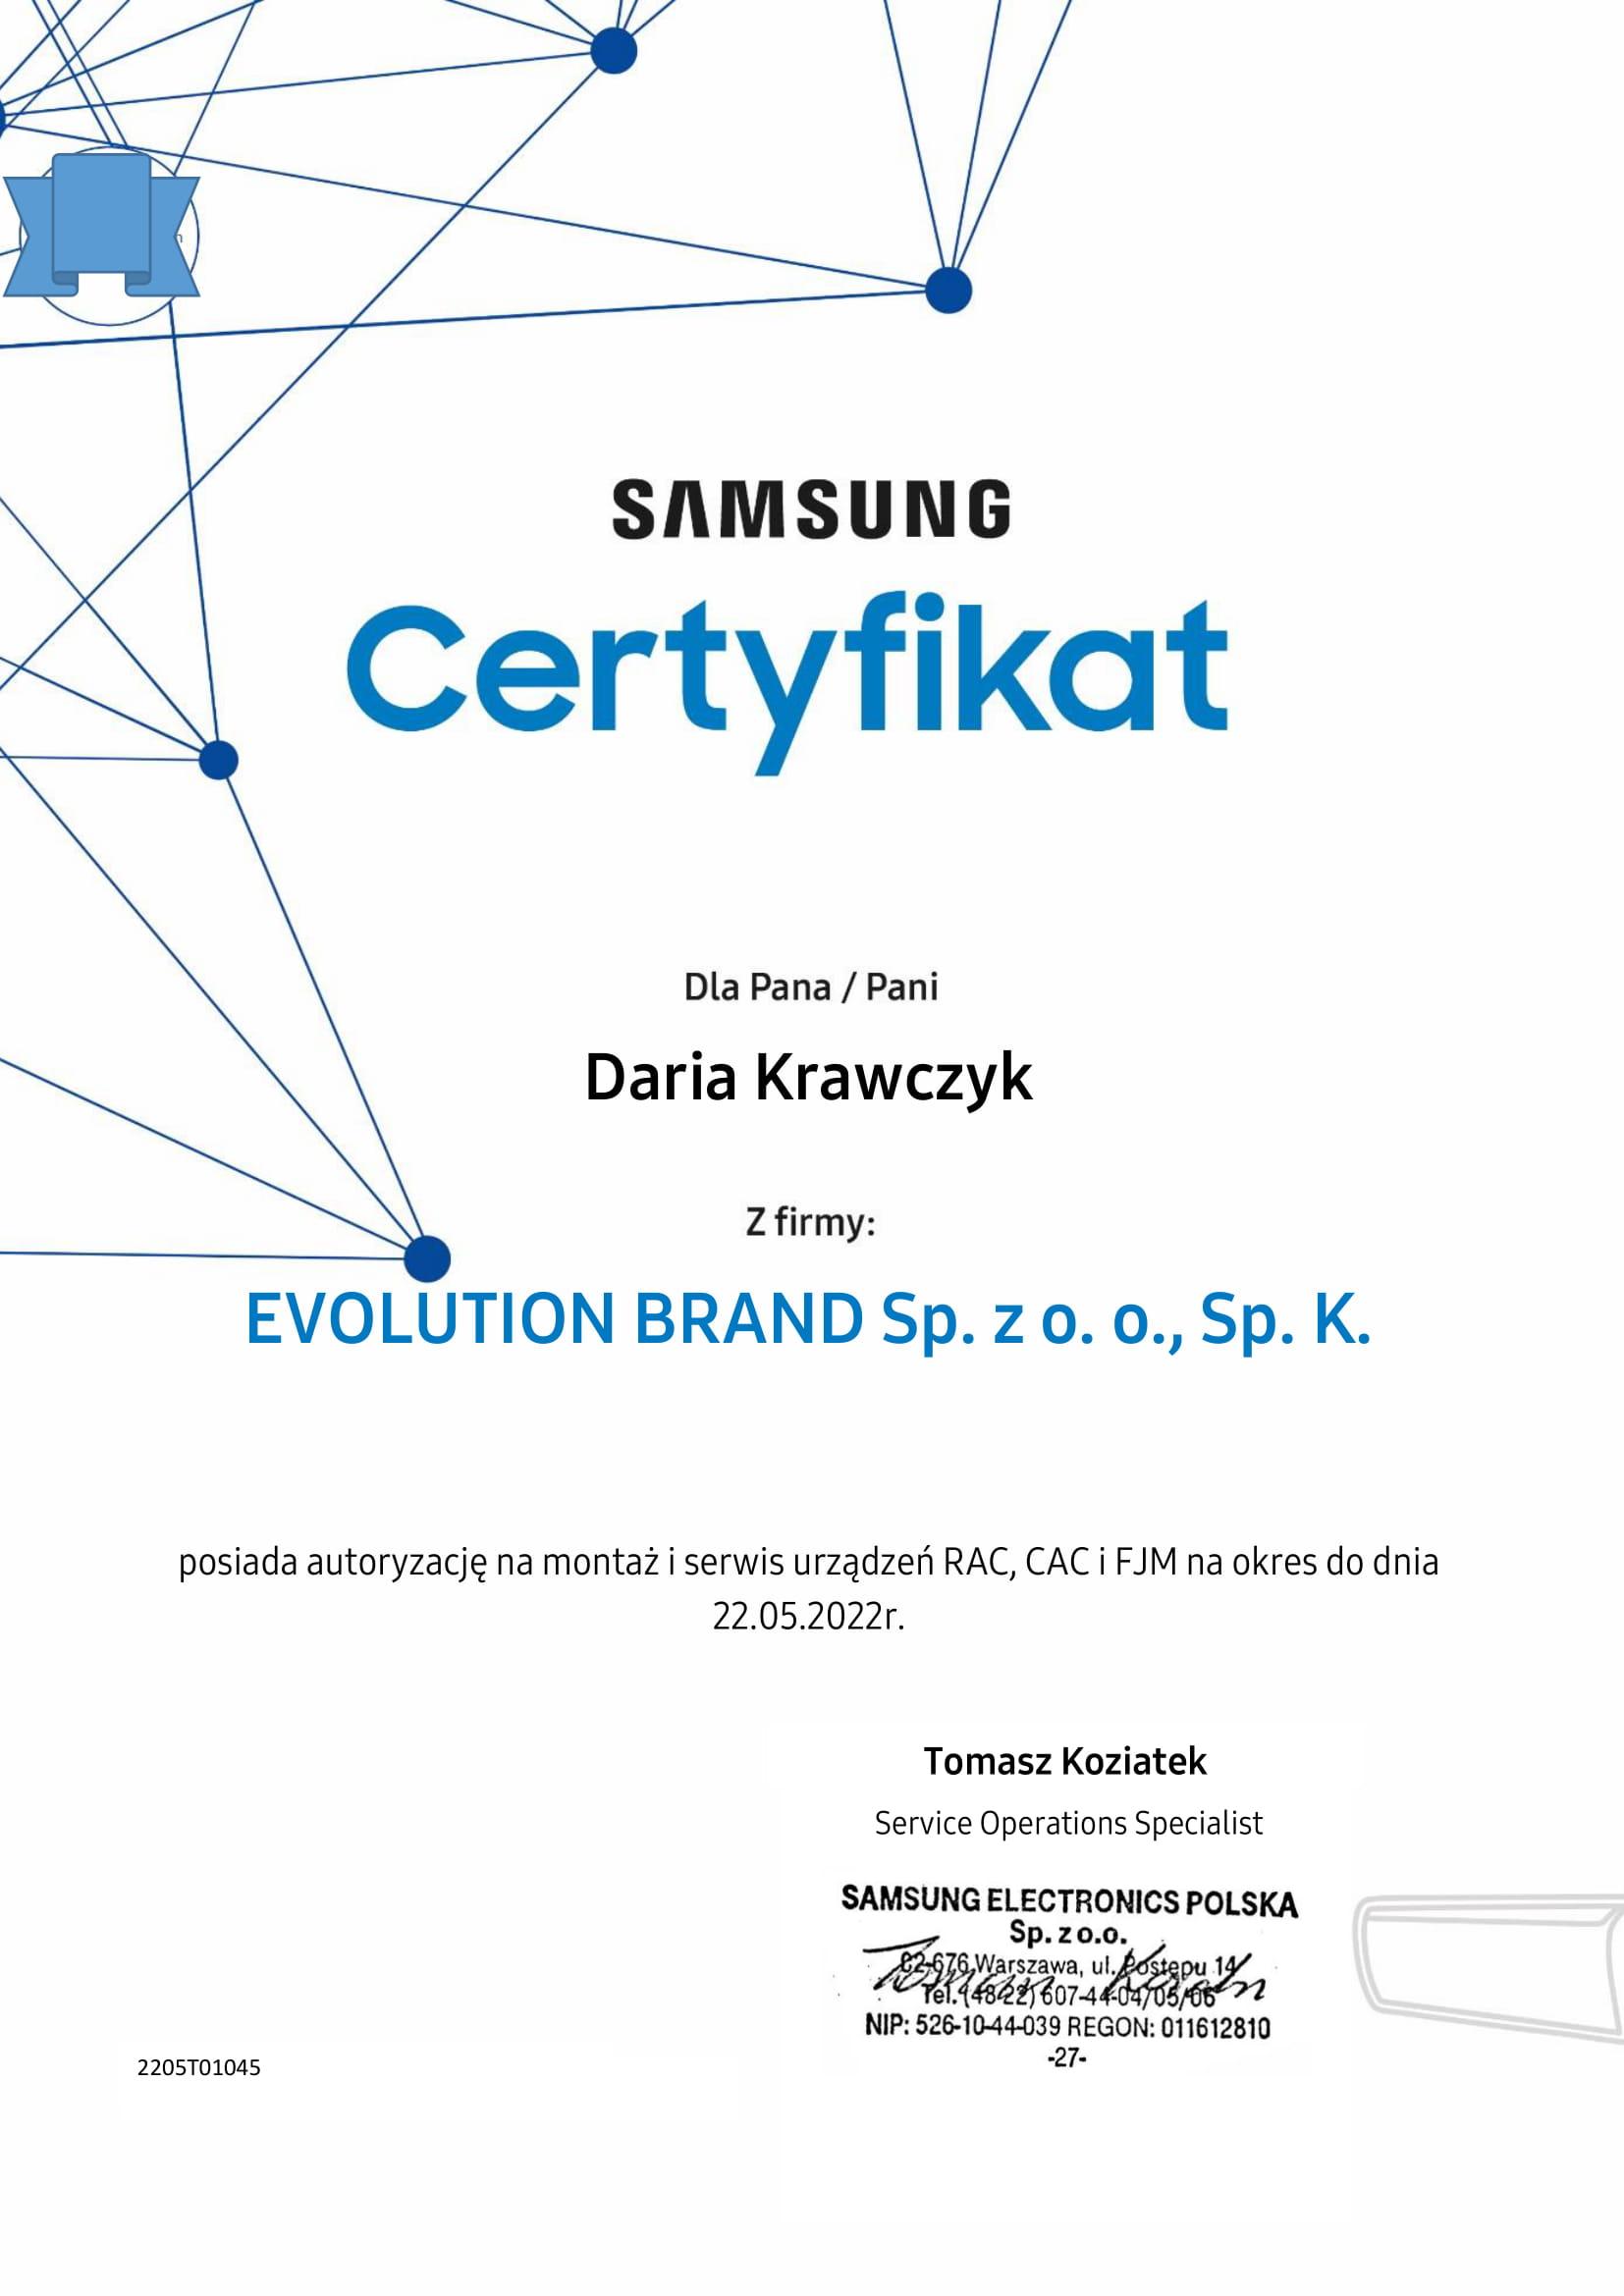 Certyfikat Samsung 2020 Evolution Brand